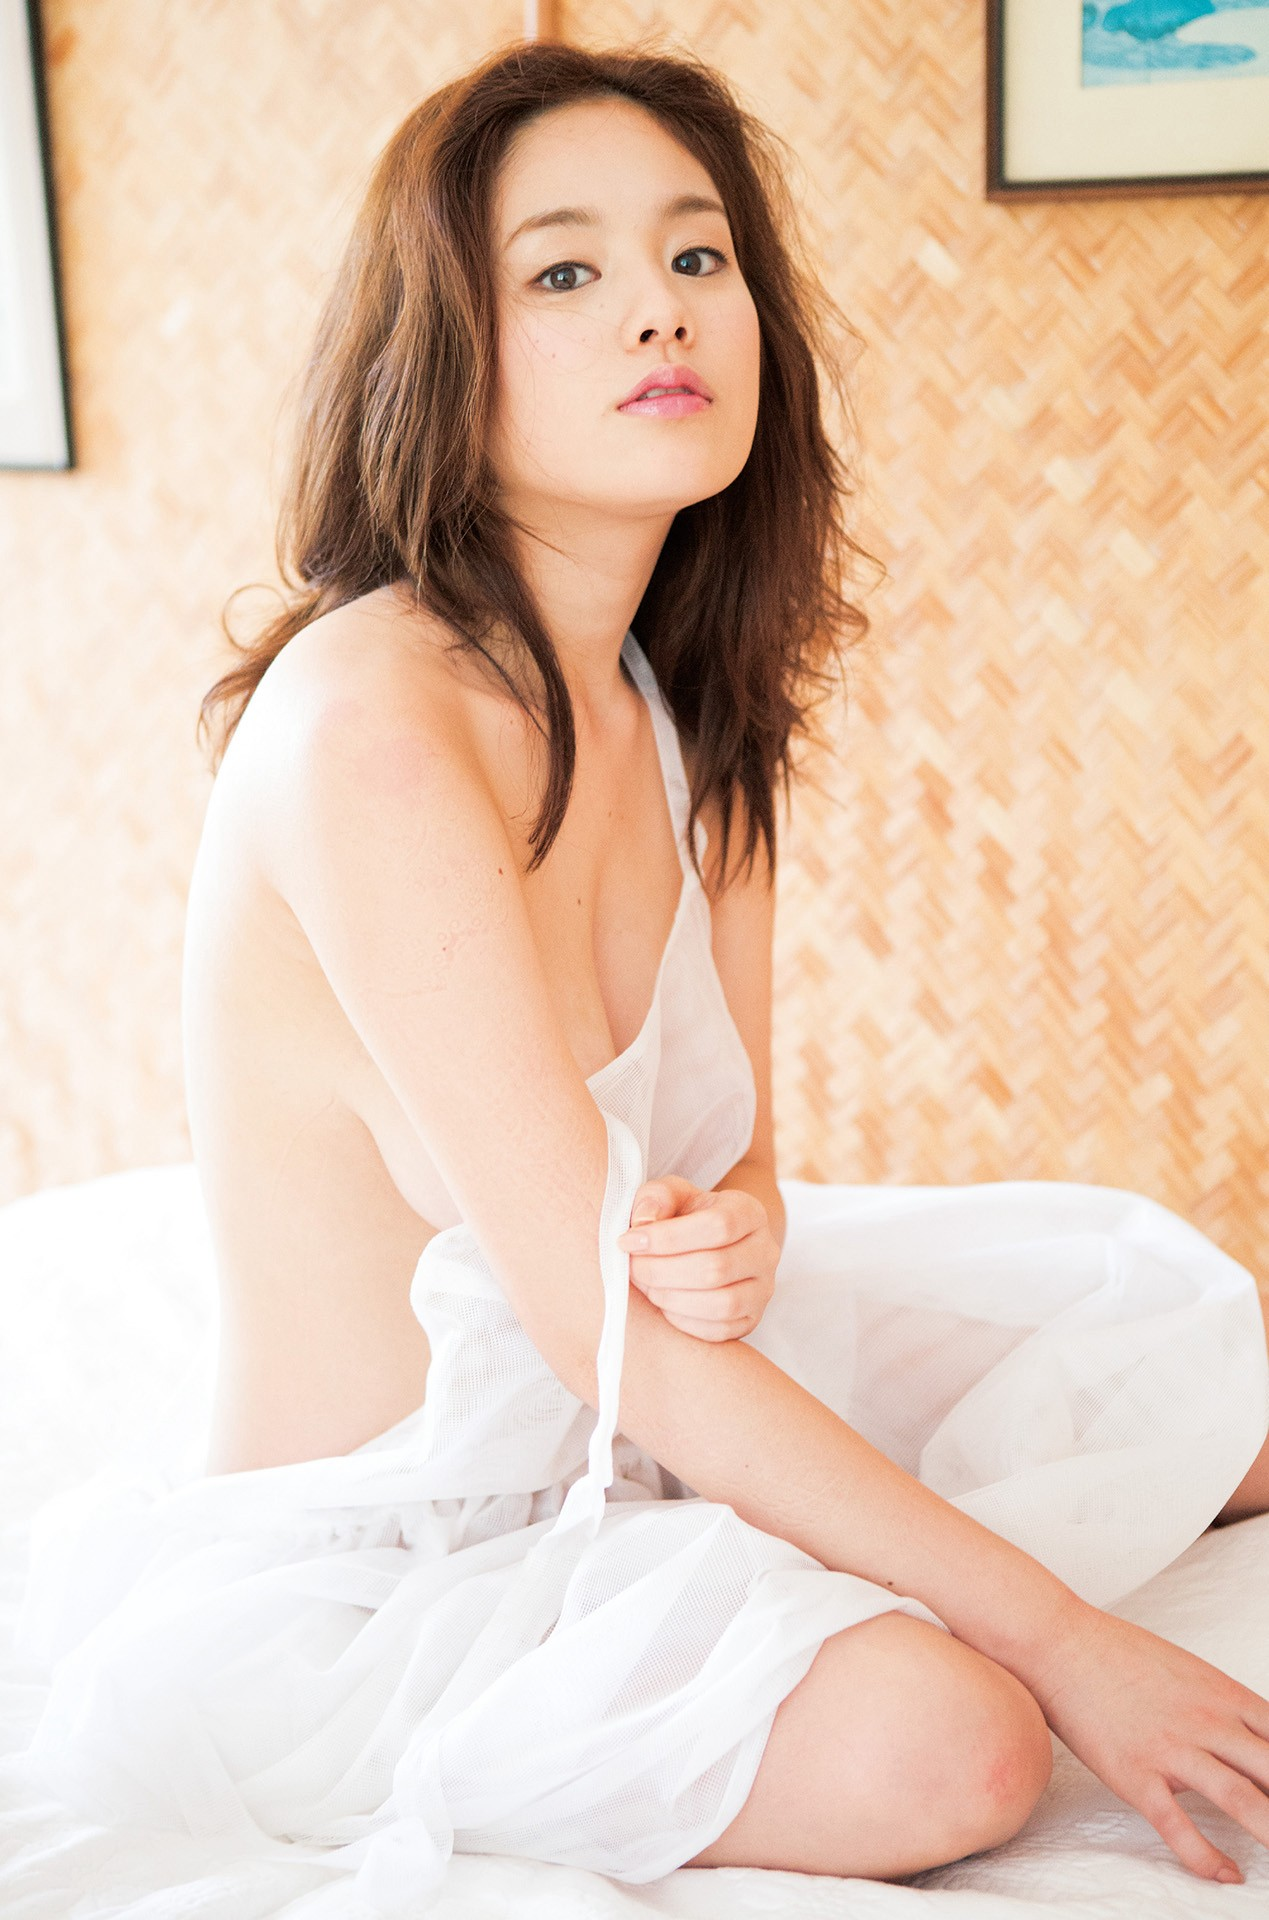 Naked miwako kakei